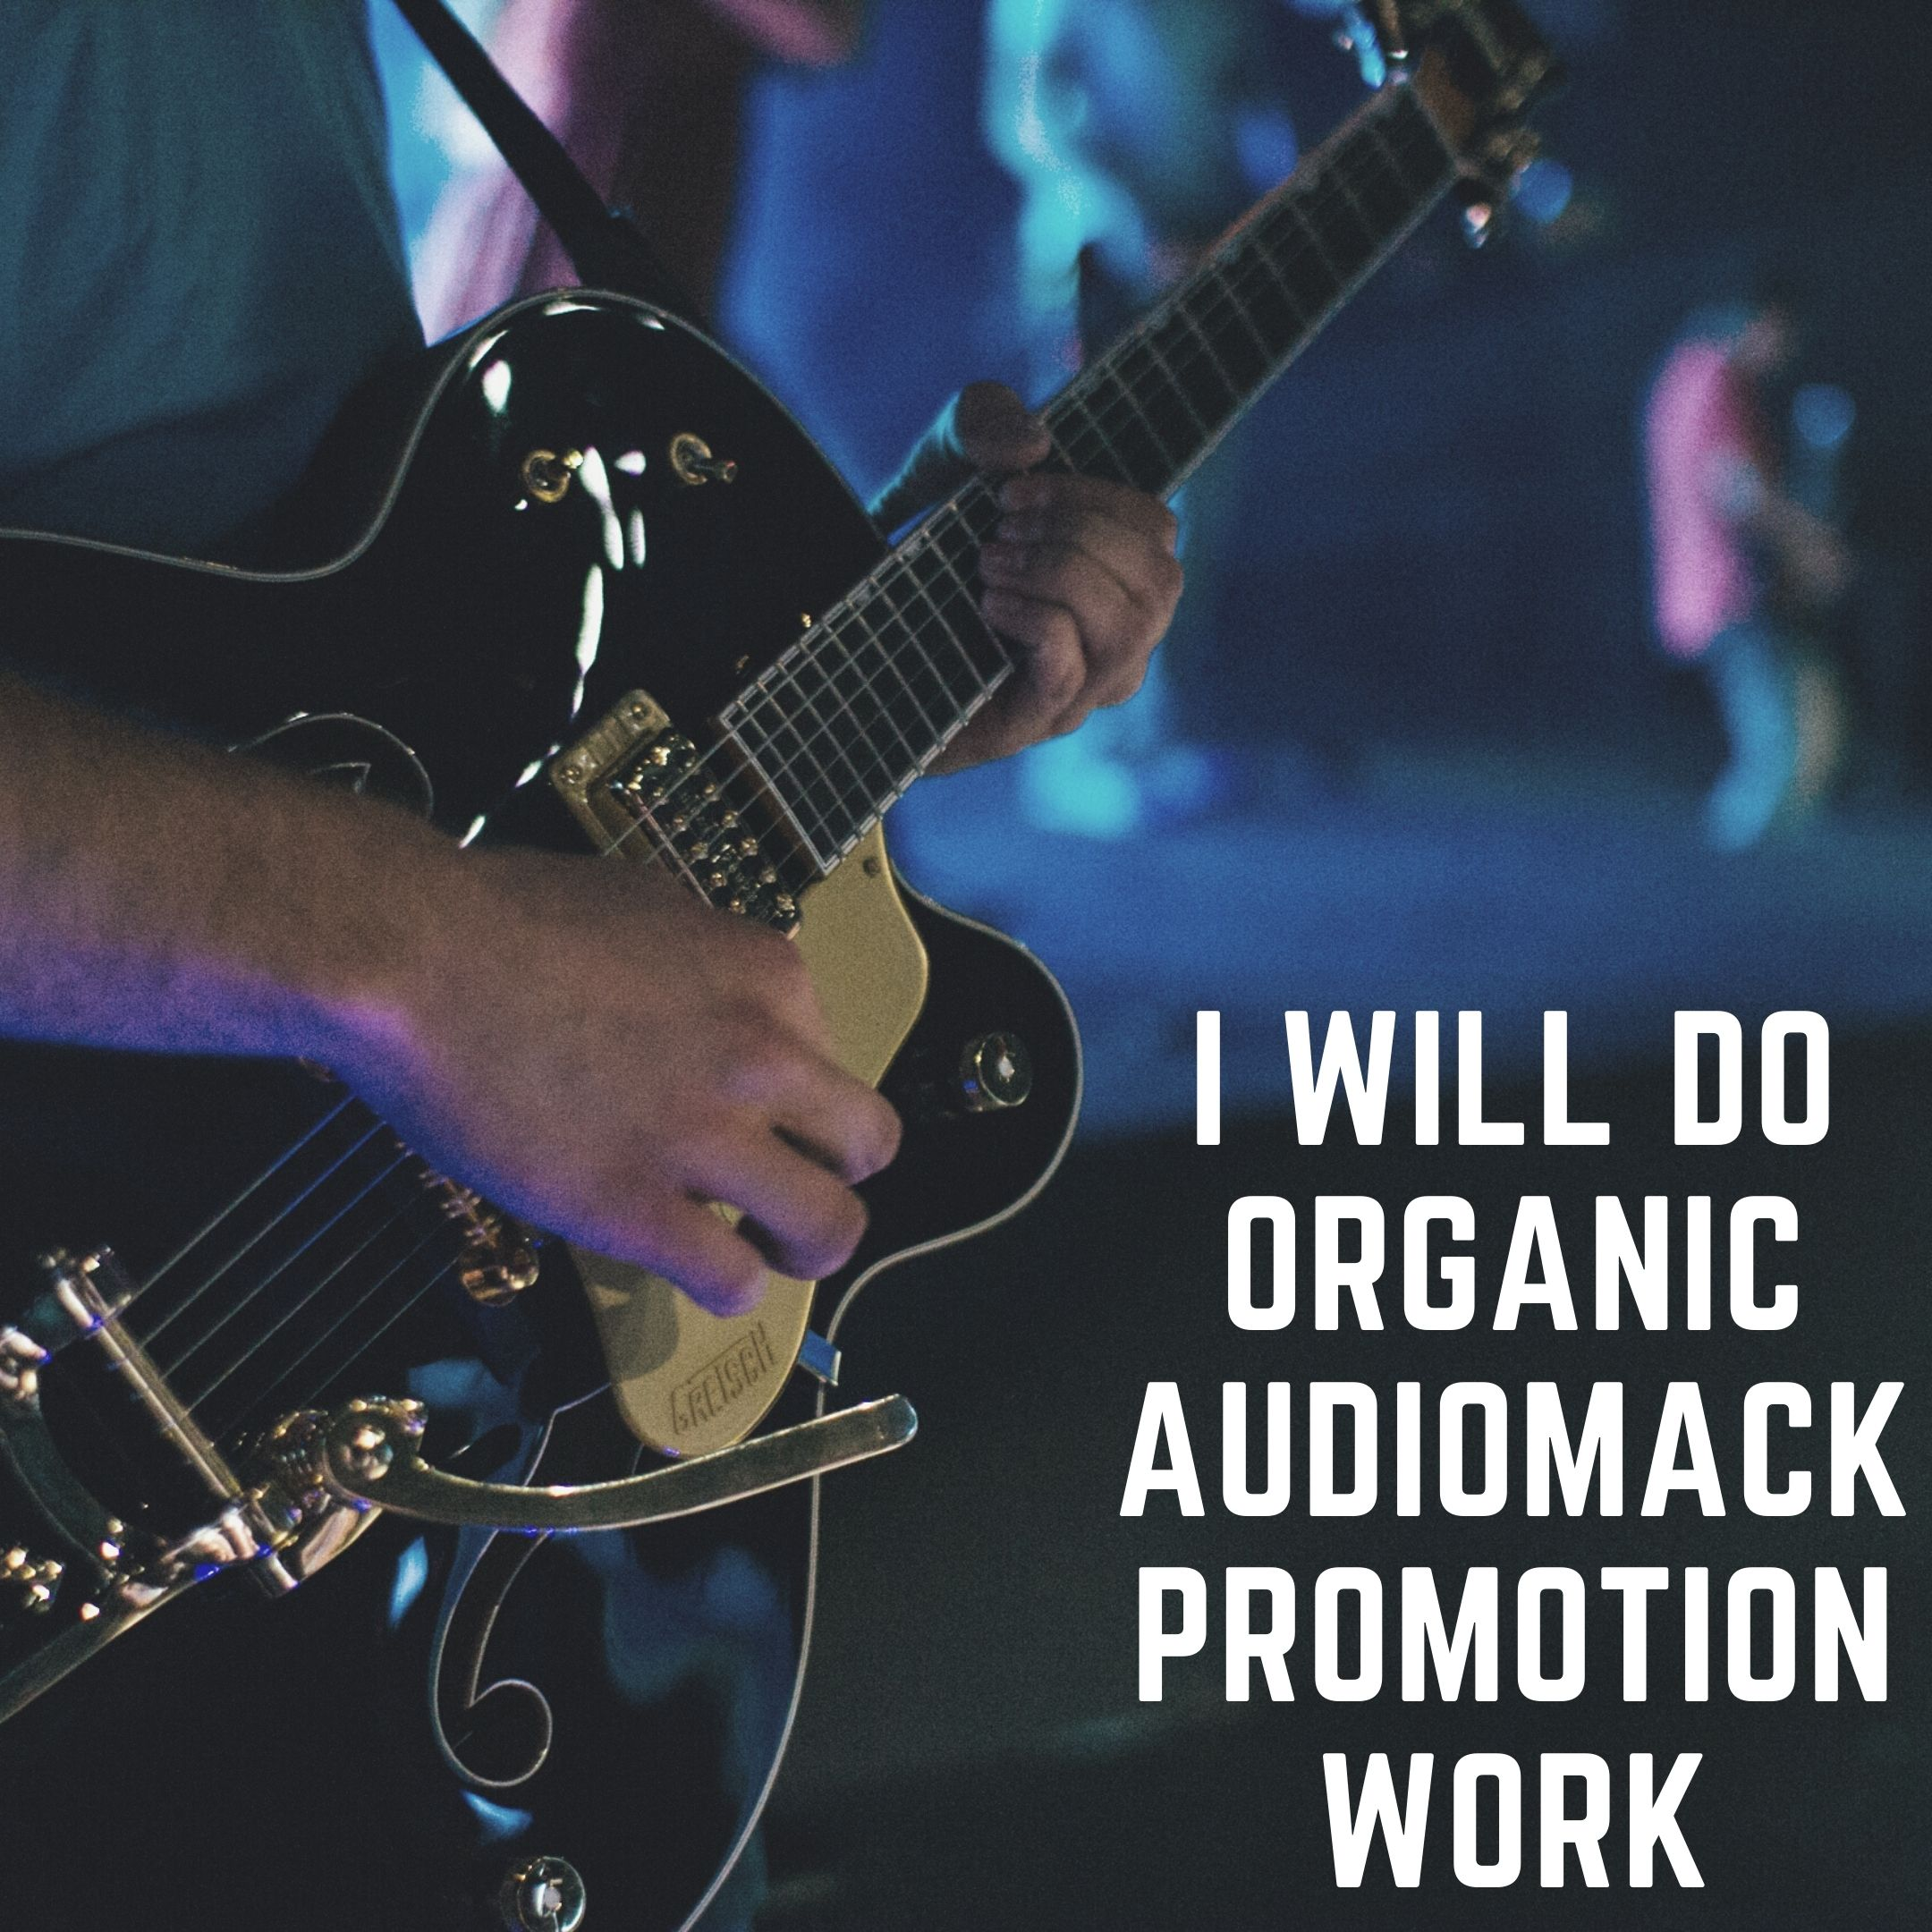 I will do organic audiomack promotion work